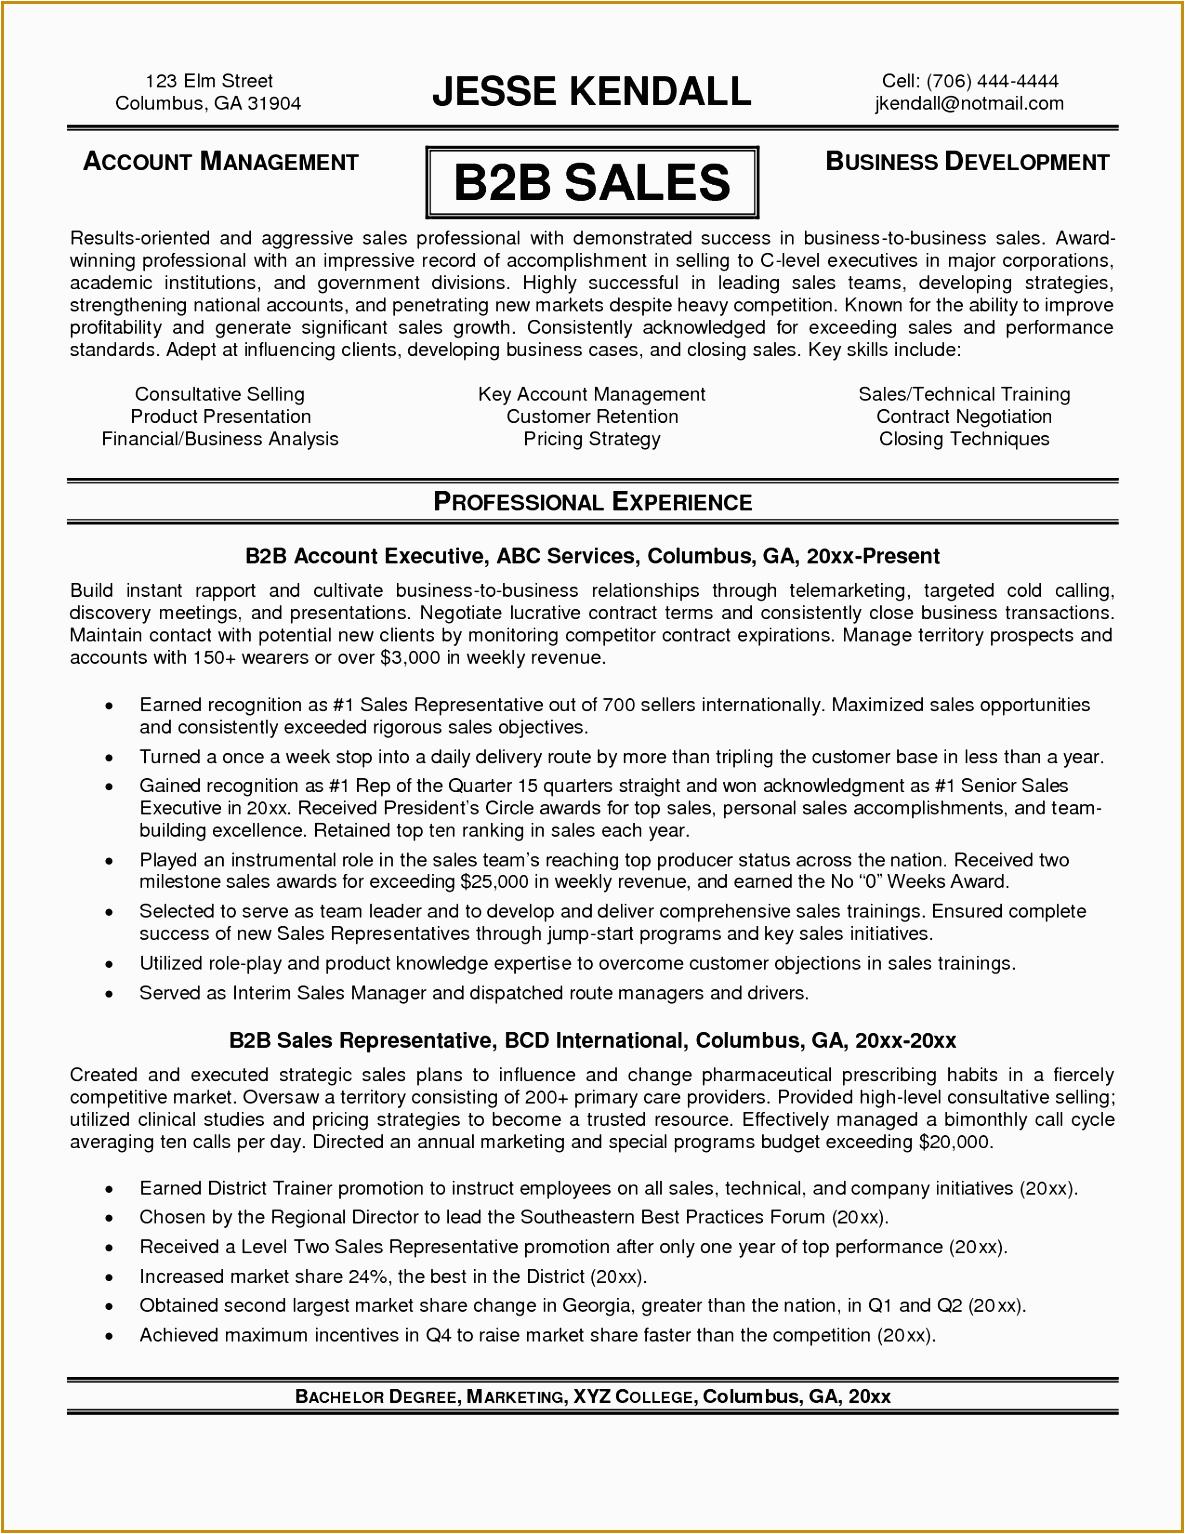 sales and marketing manager job description pdf